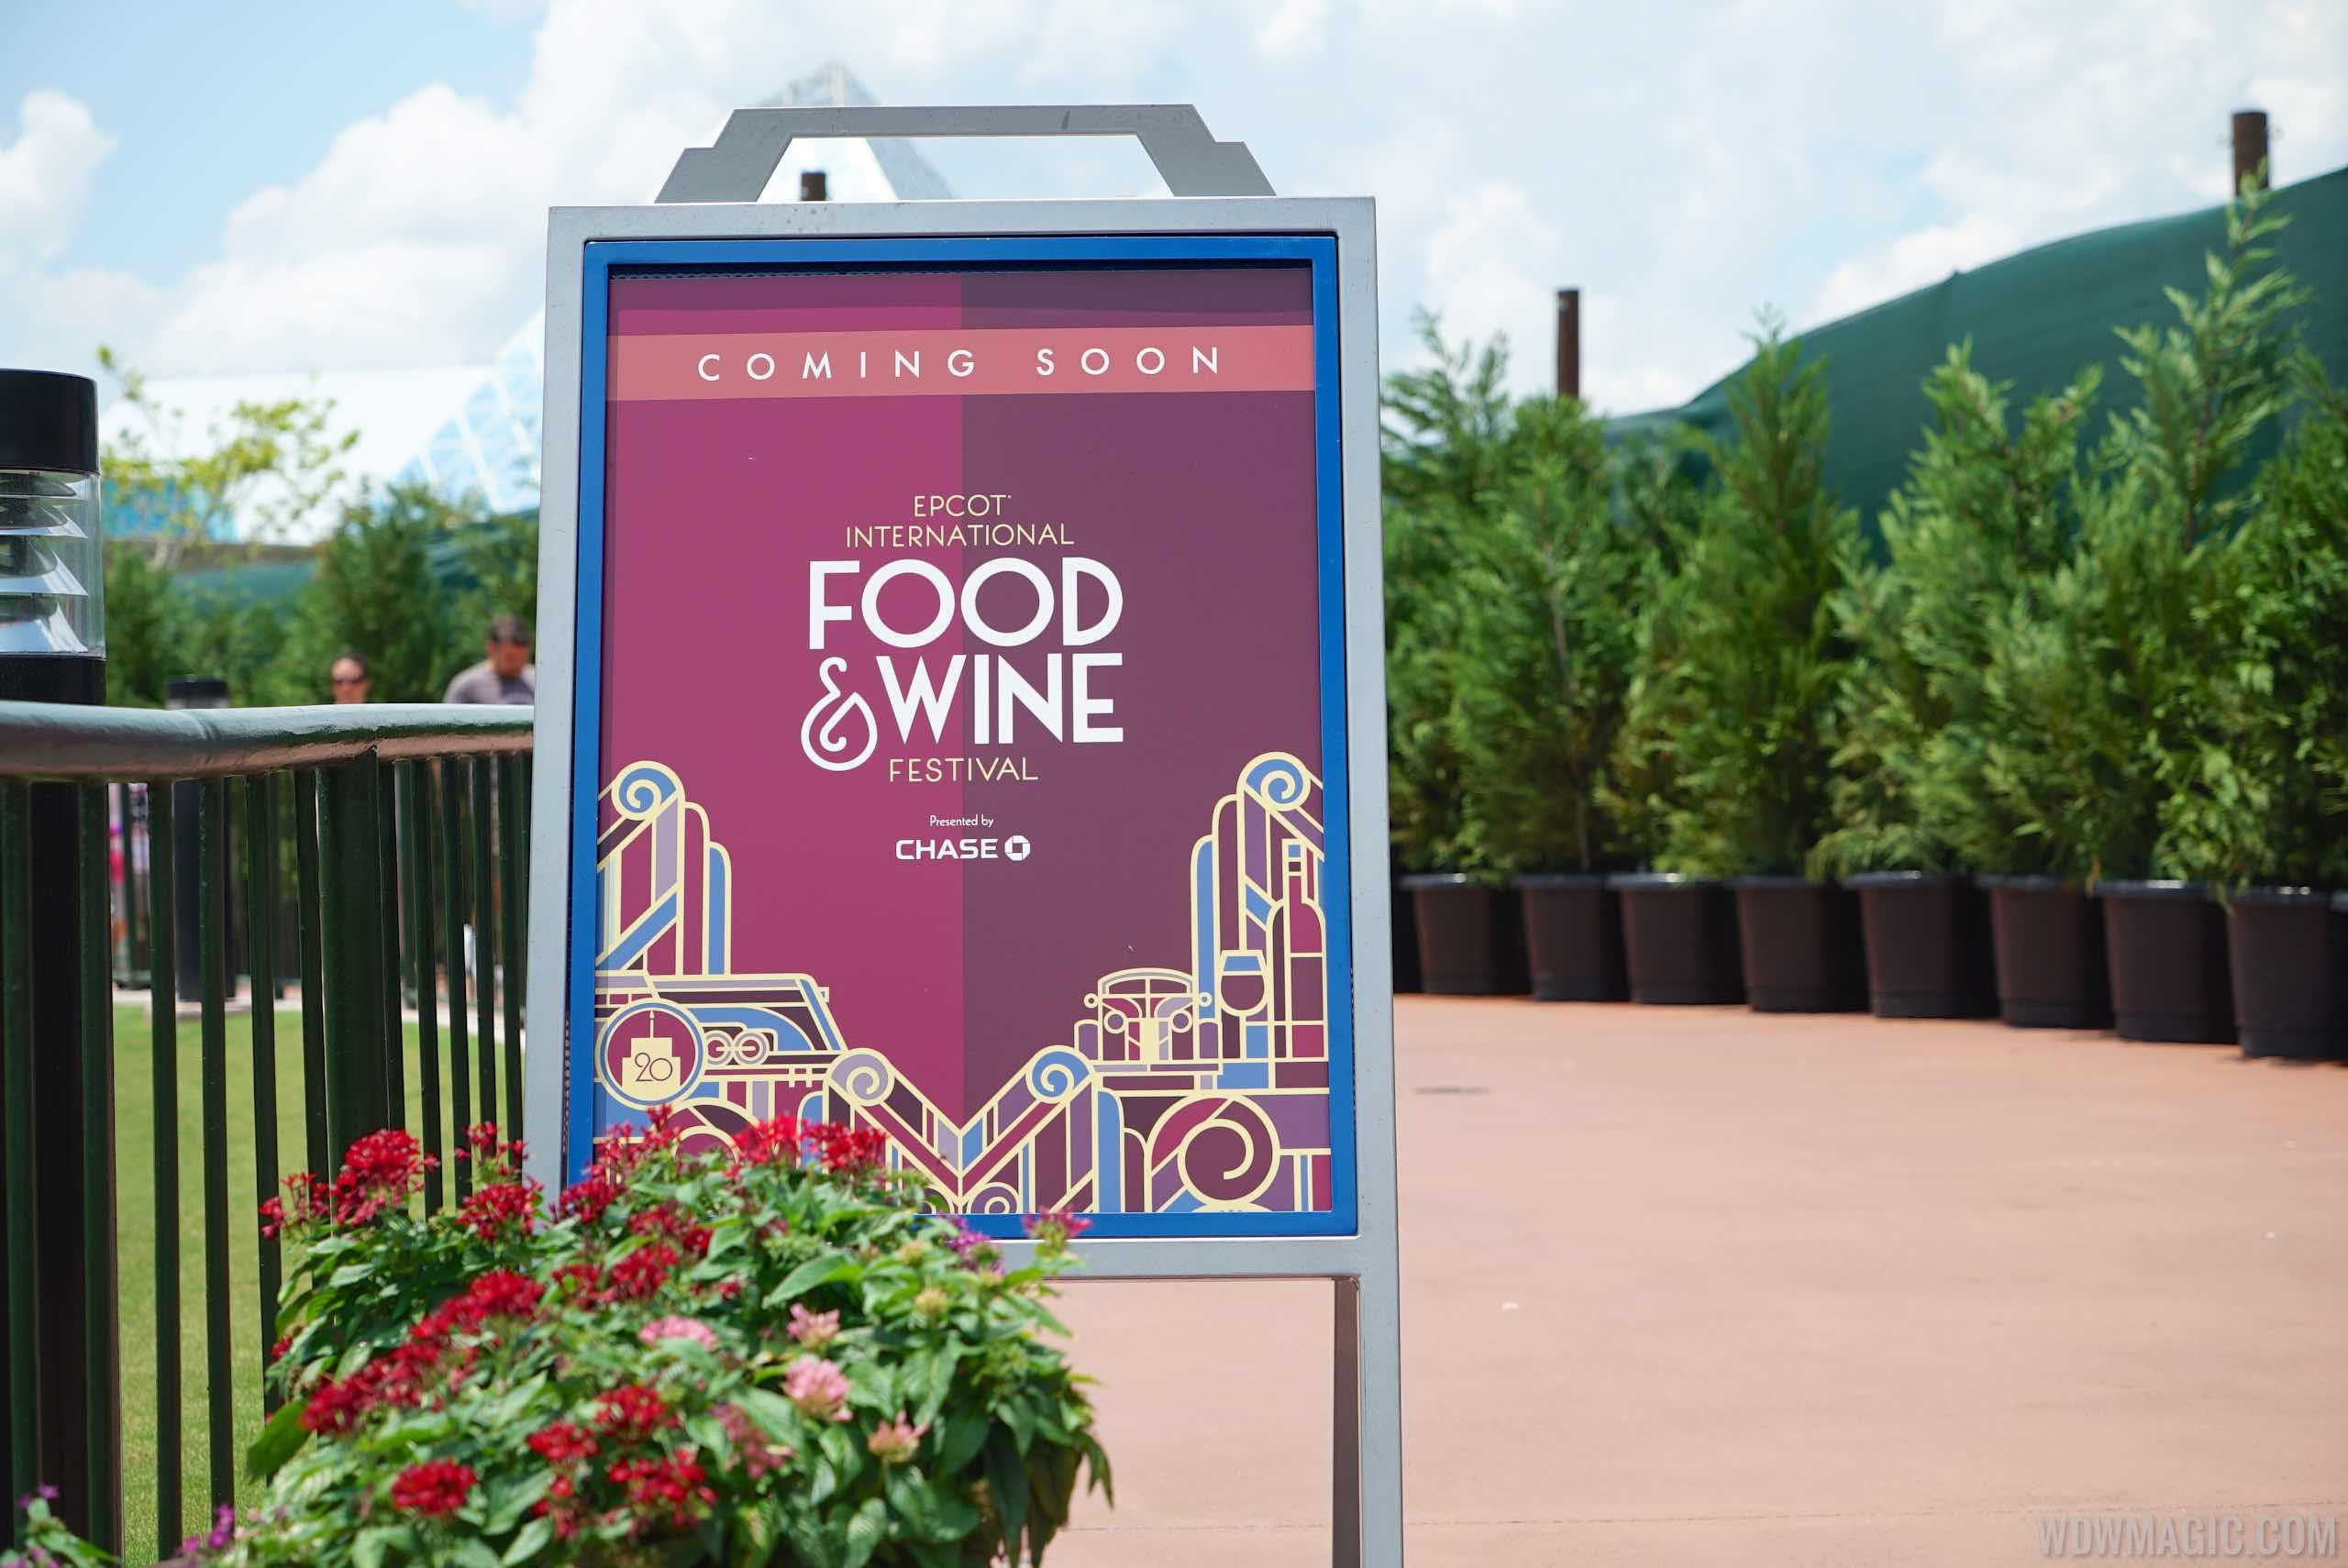 2015 Food and Wine Festival setup in Future World